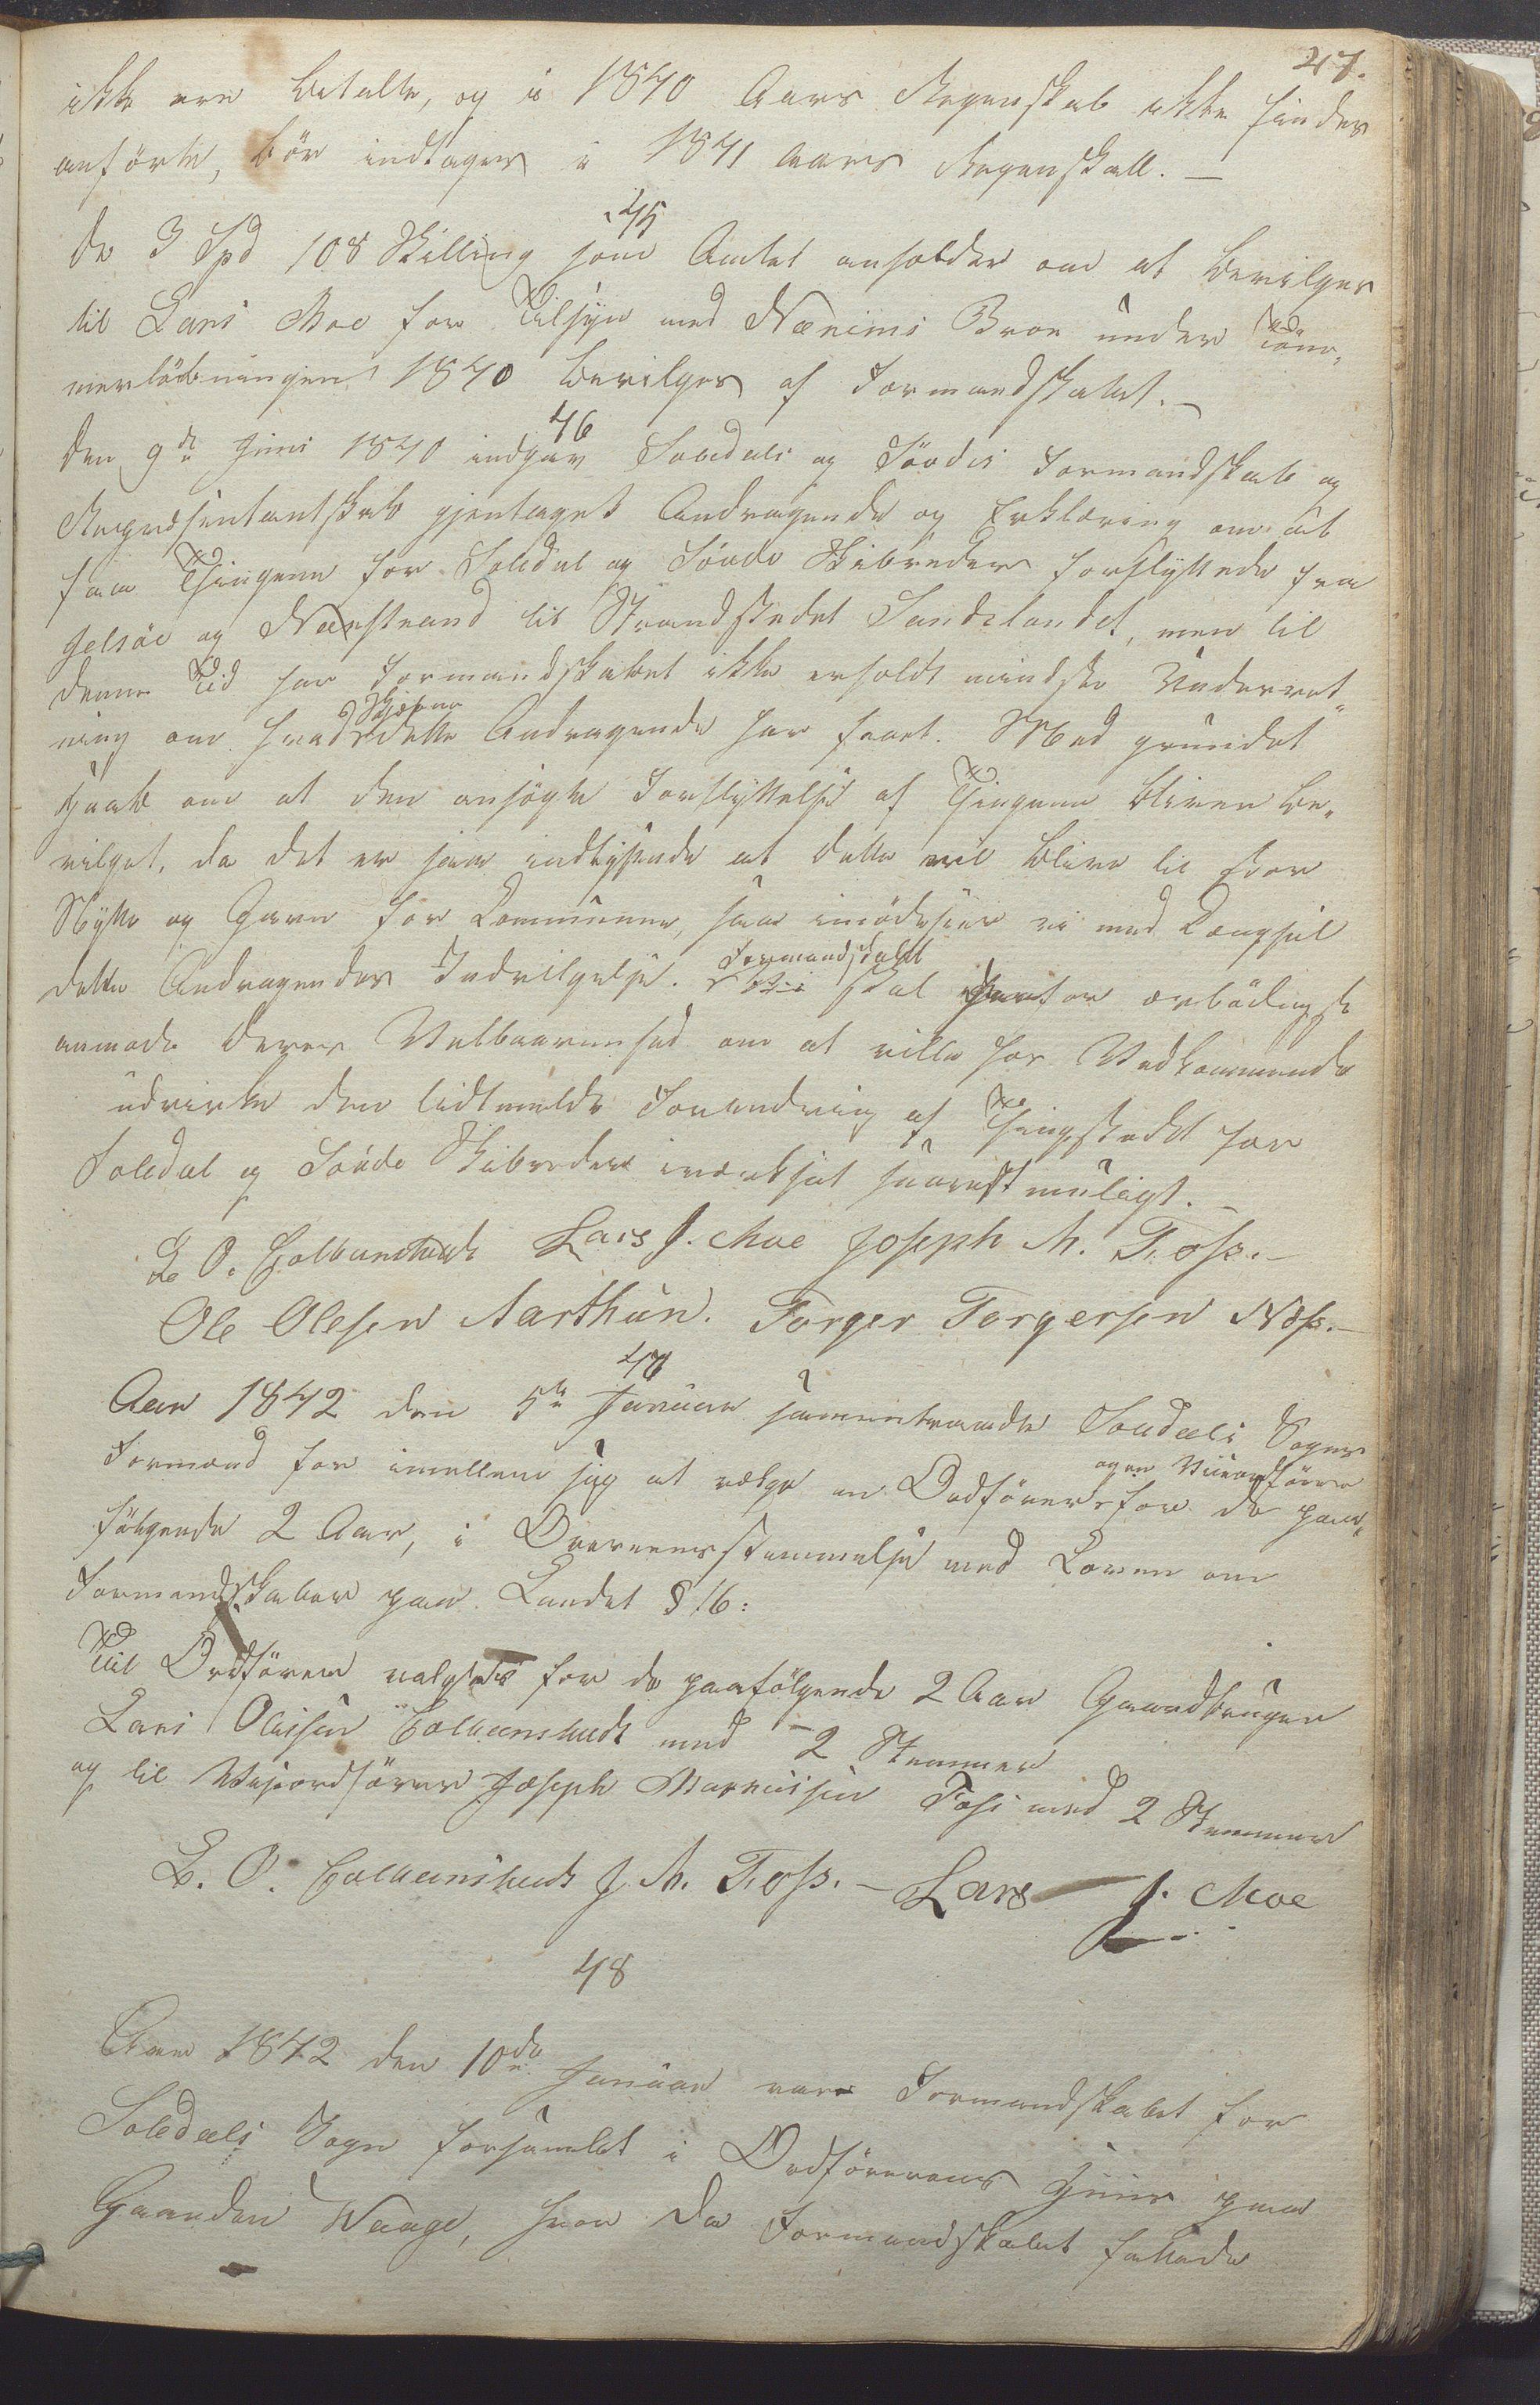 IKAR, Suldal kommune - Formannskapet/Rådmannen, A/Aa/L0001: Møtebok, 1837-1876, s. 47a